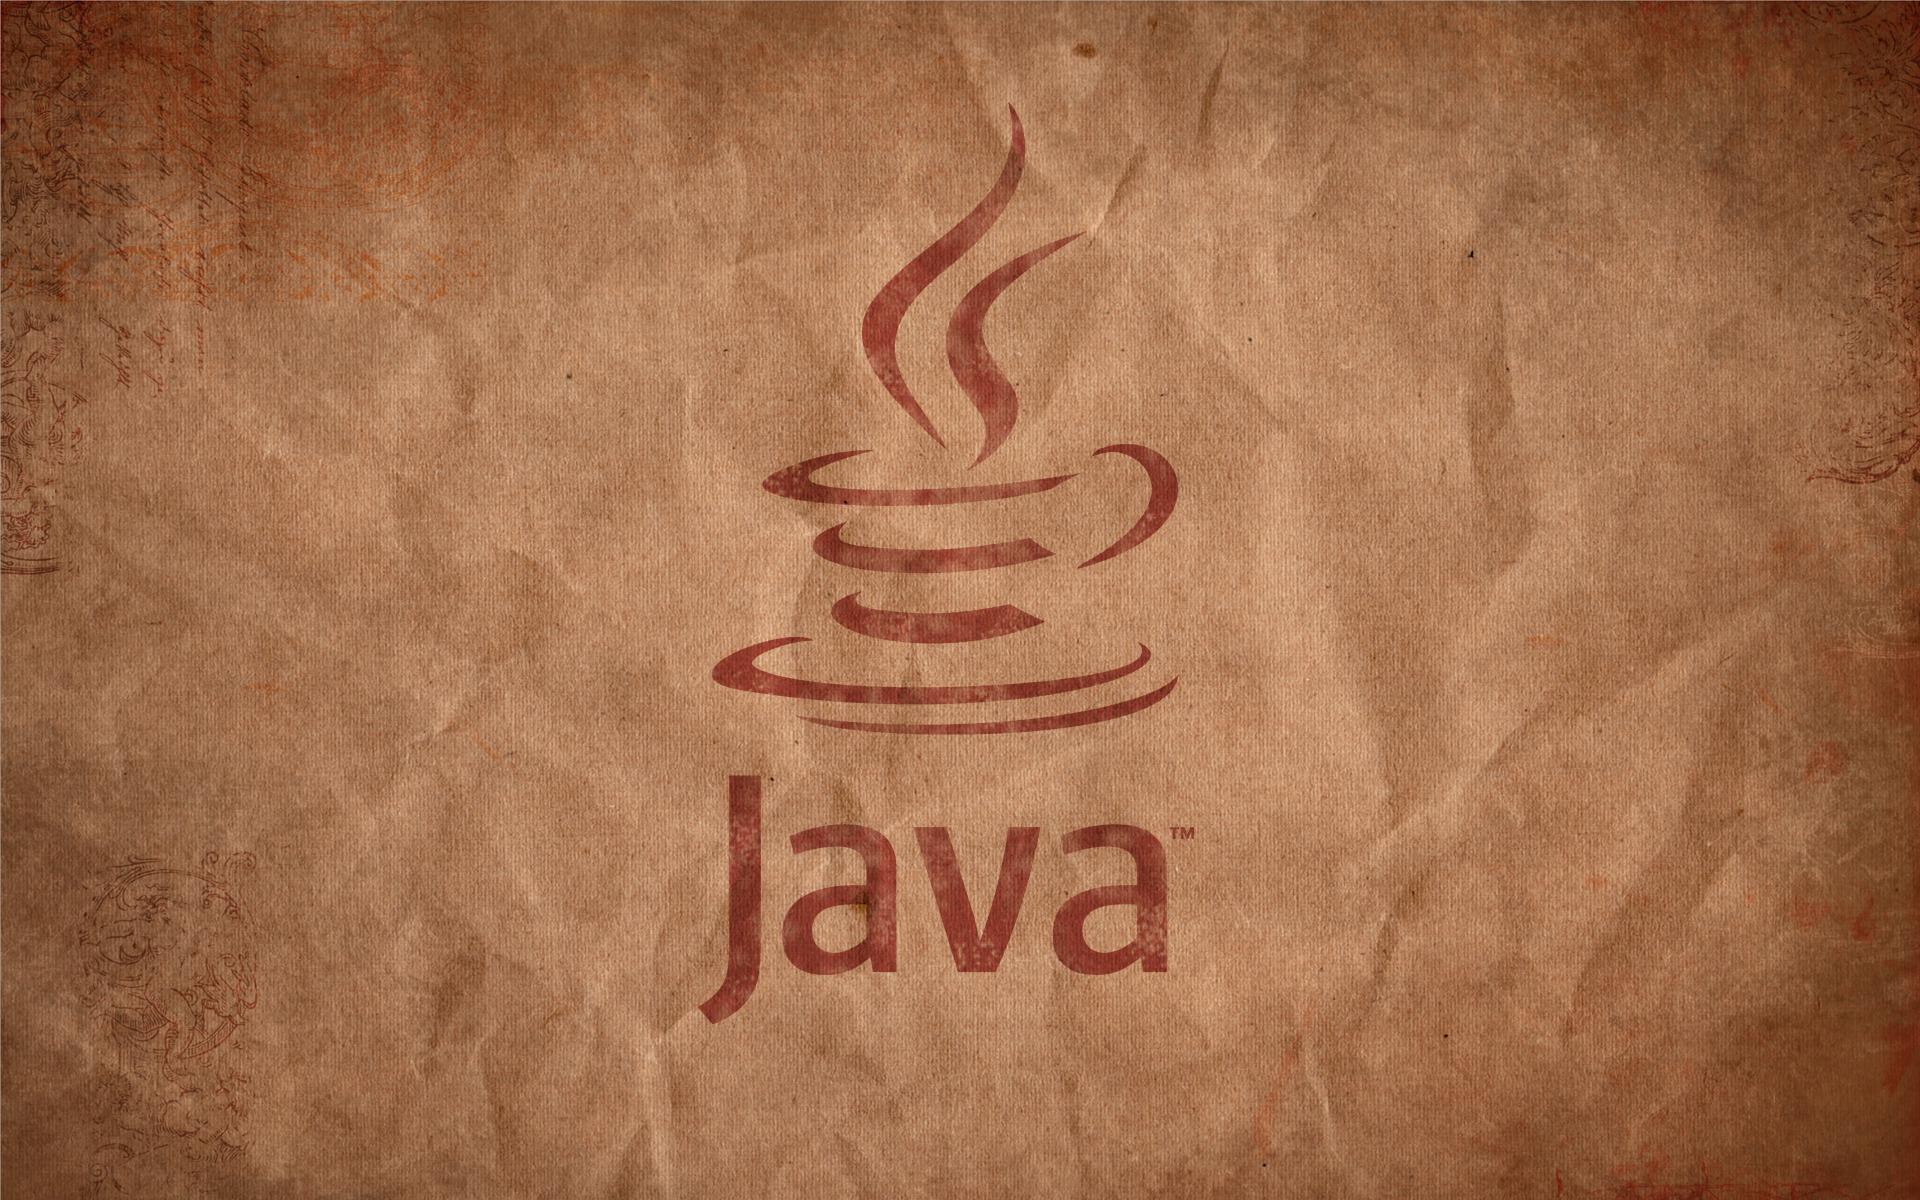 Програмиране с Java (Основно ниво)